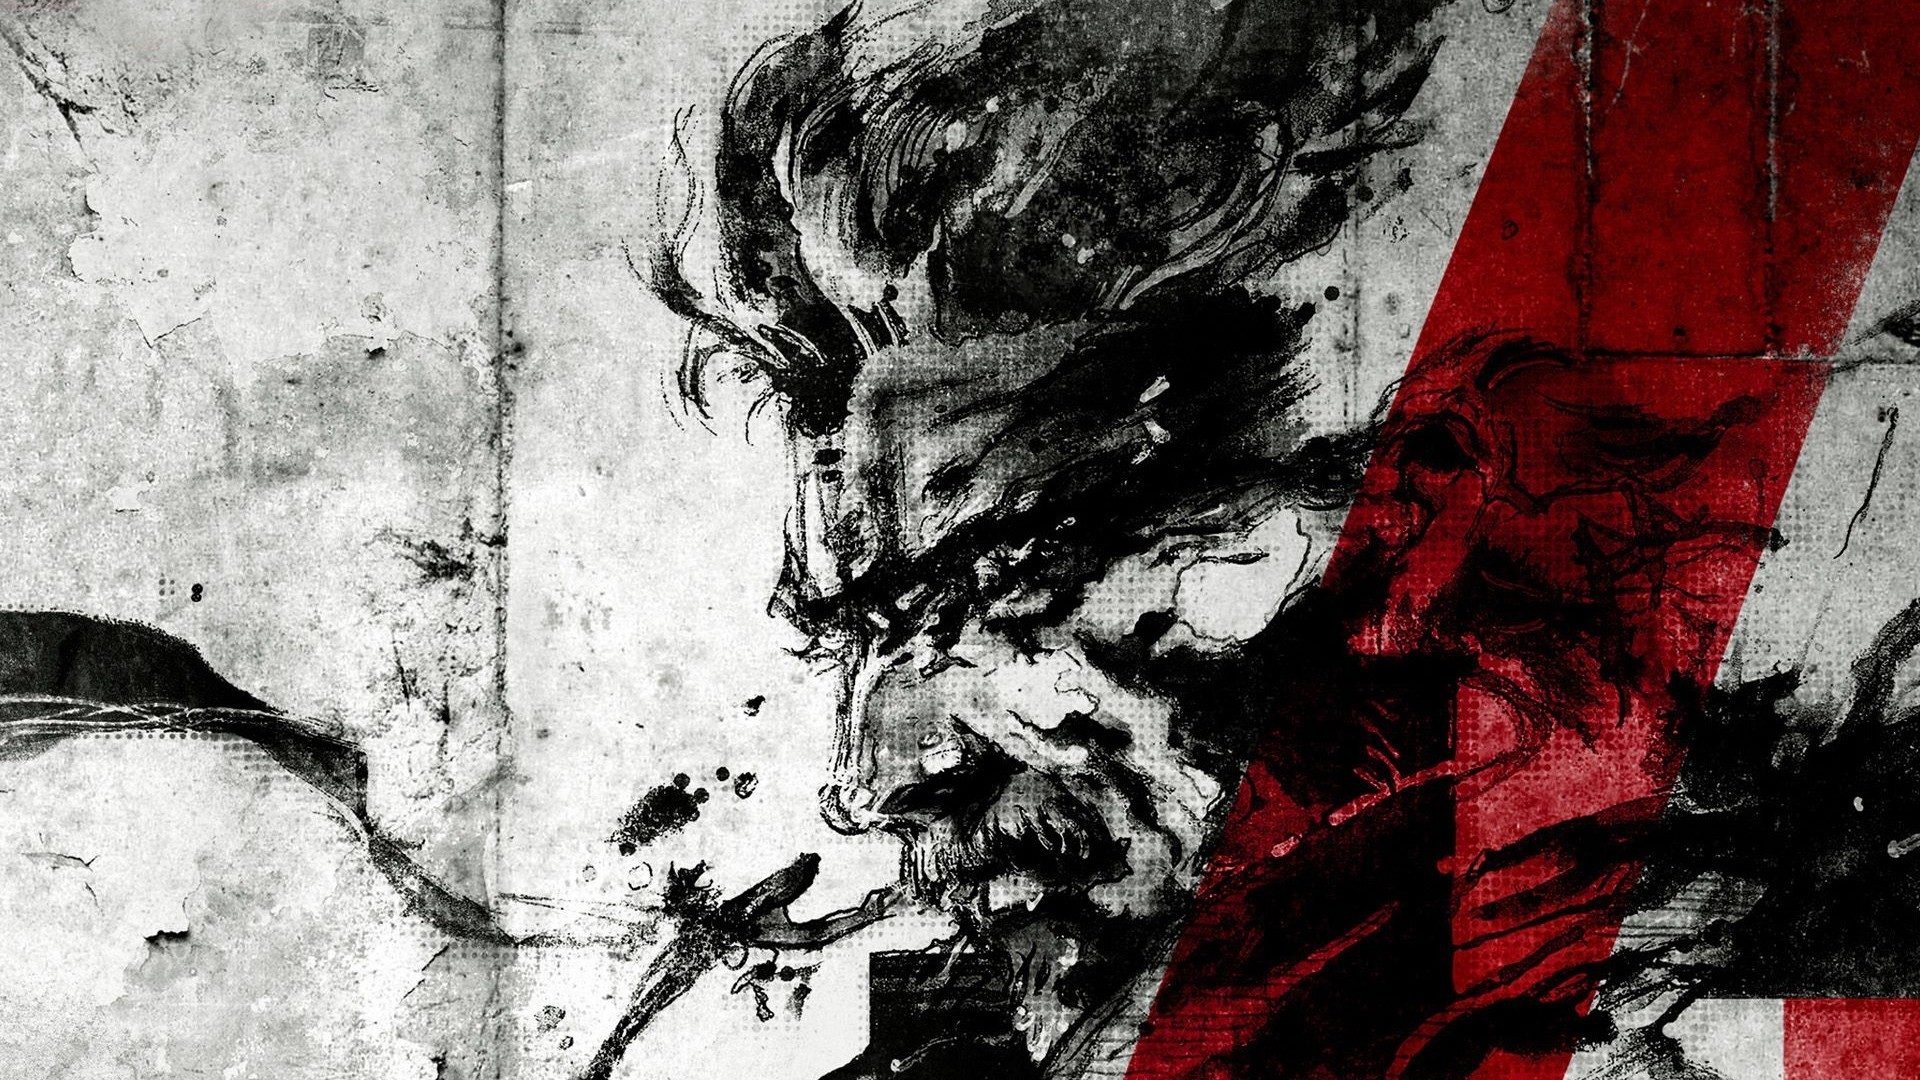 Res: 1920x1080, Metal Gear Solid 5 Wallpaper